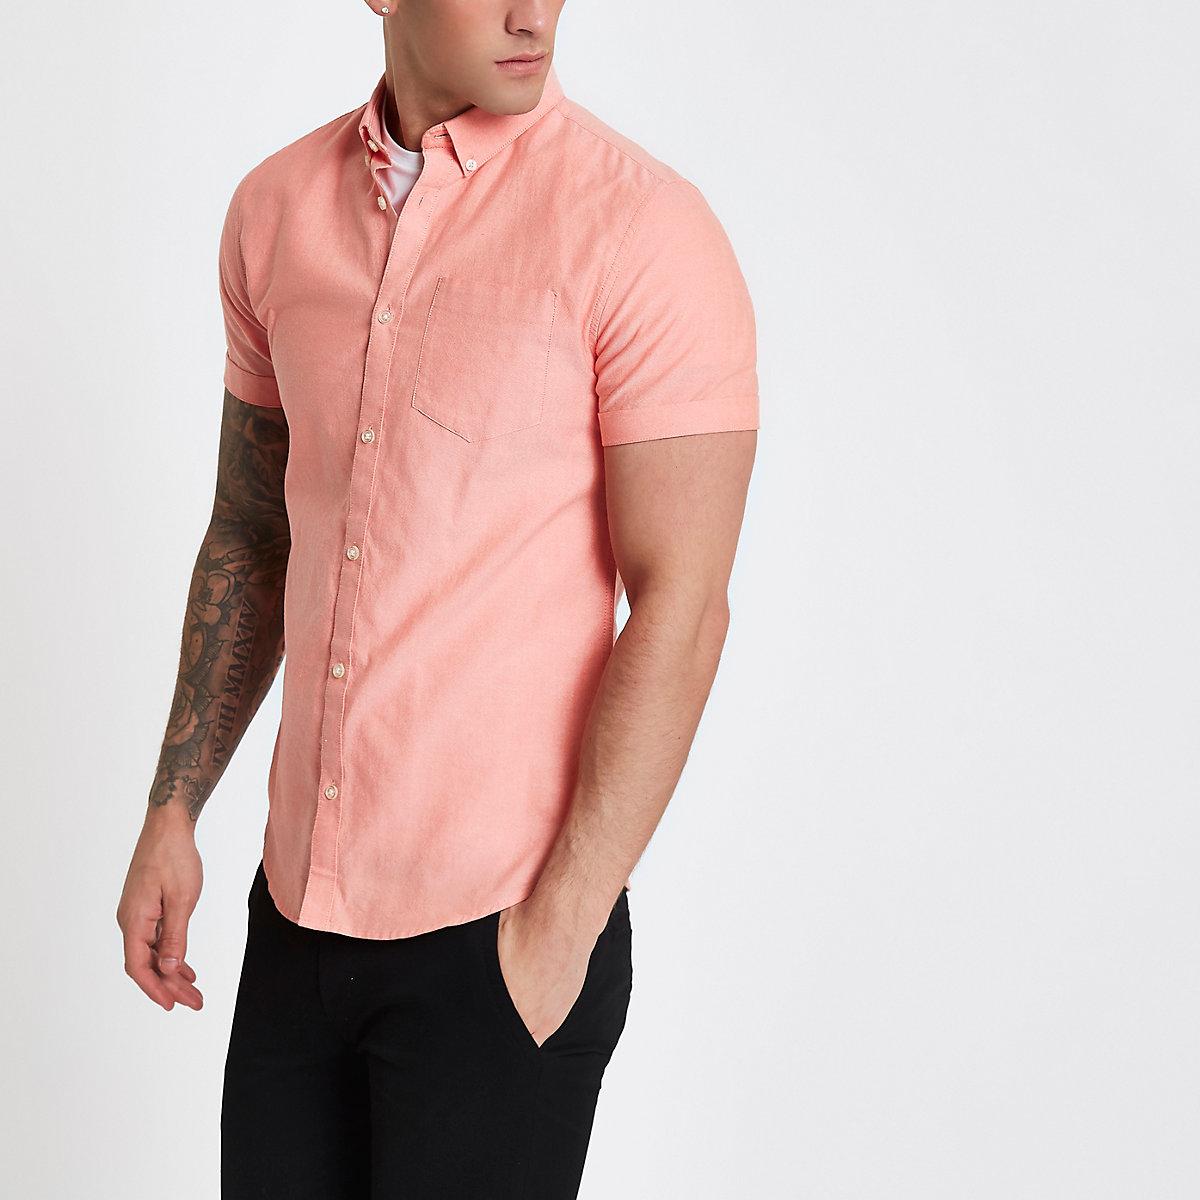 Coral short sleeve button-down Oxford shirt